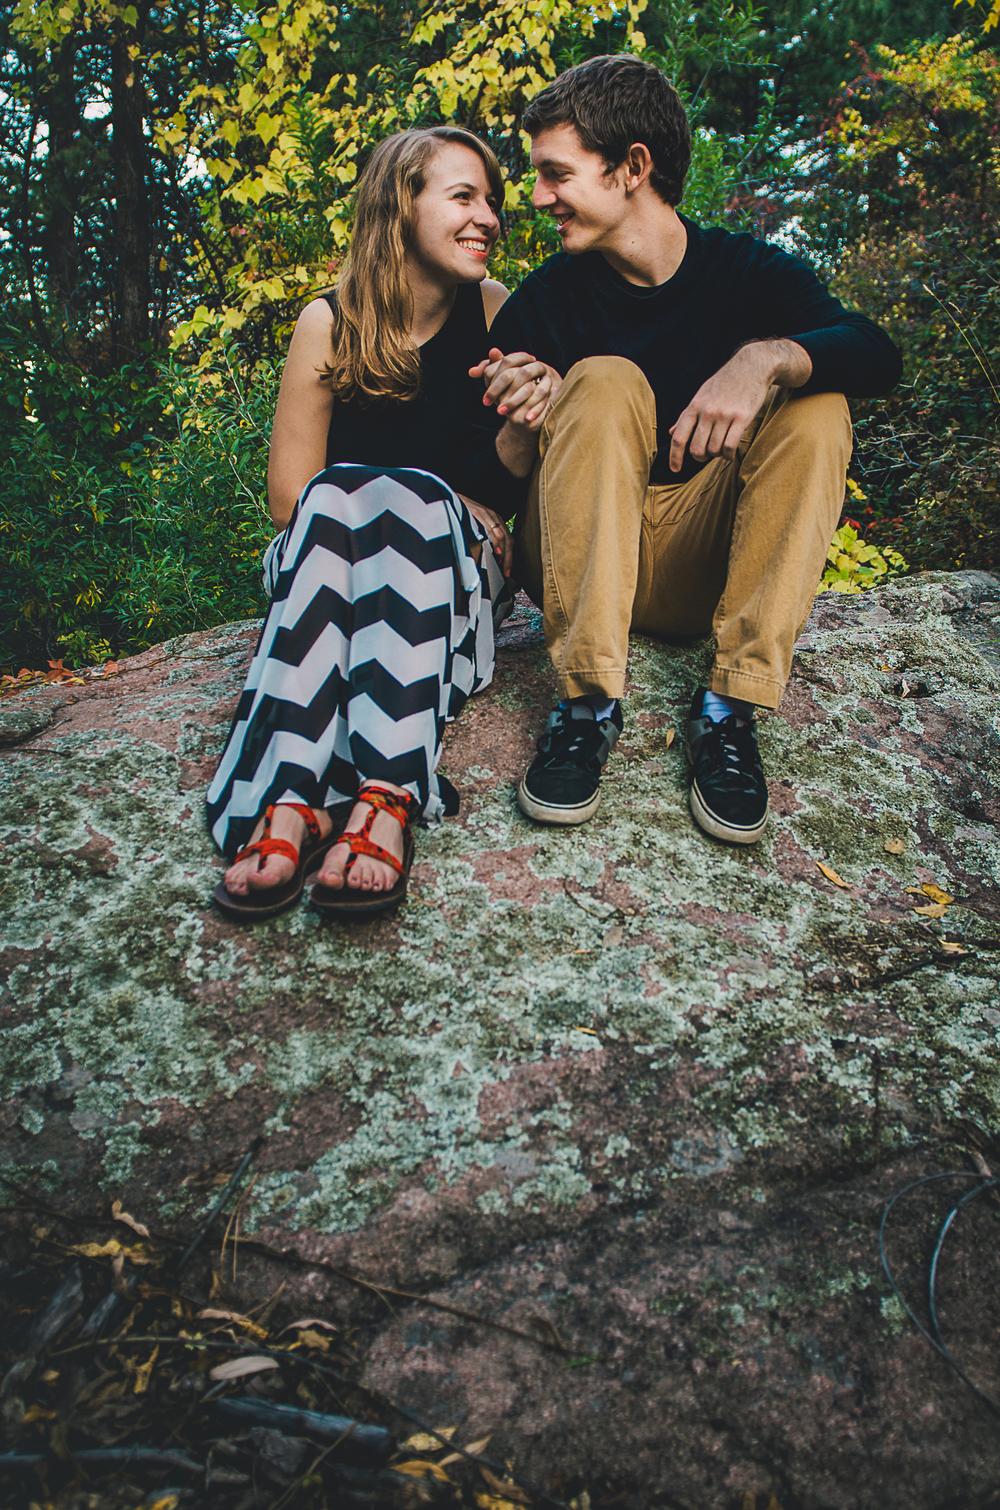 Amy&Jake-Engagements-JPEGS-1-30.jpg